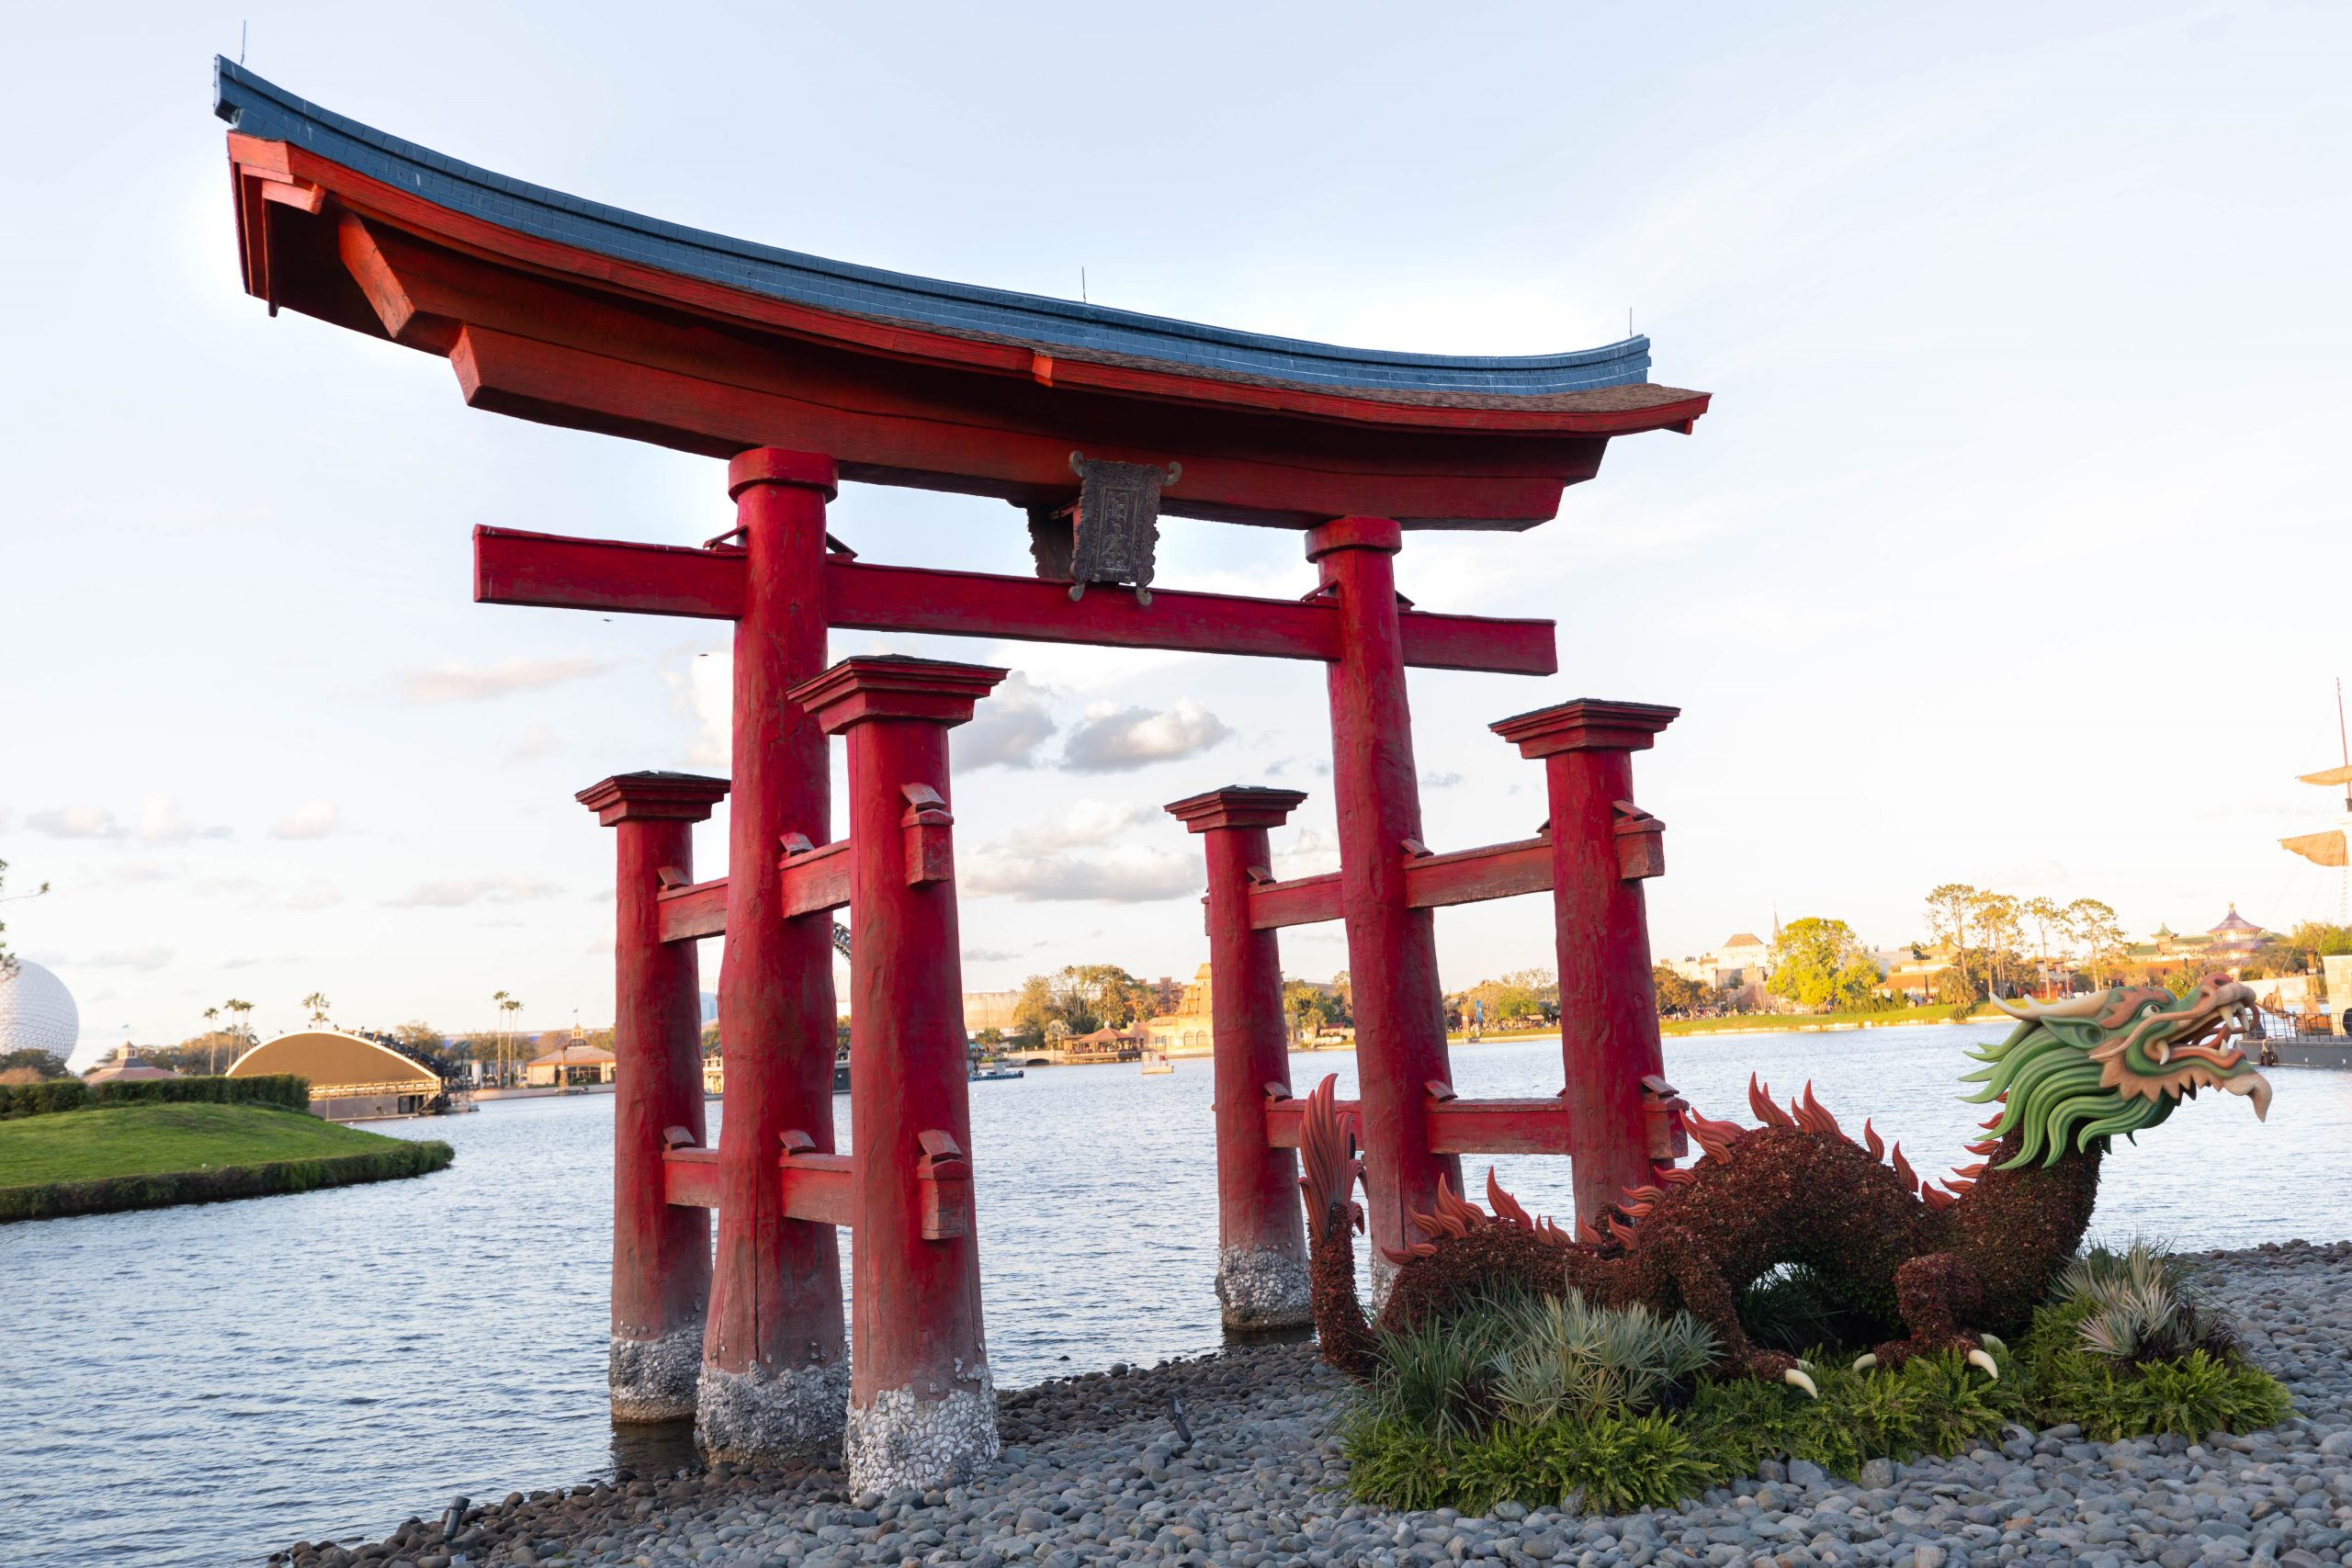 Red Torii Gate Japan Epcot Walt Disney World by Luxury Travel Writer and Photographer Annie Fairfax